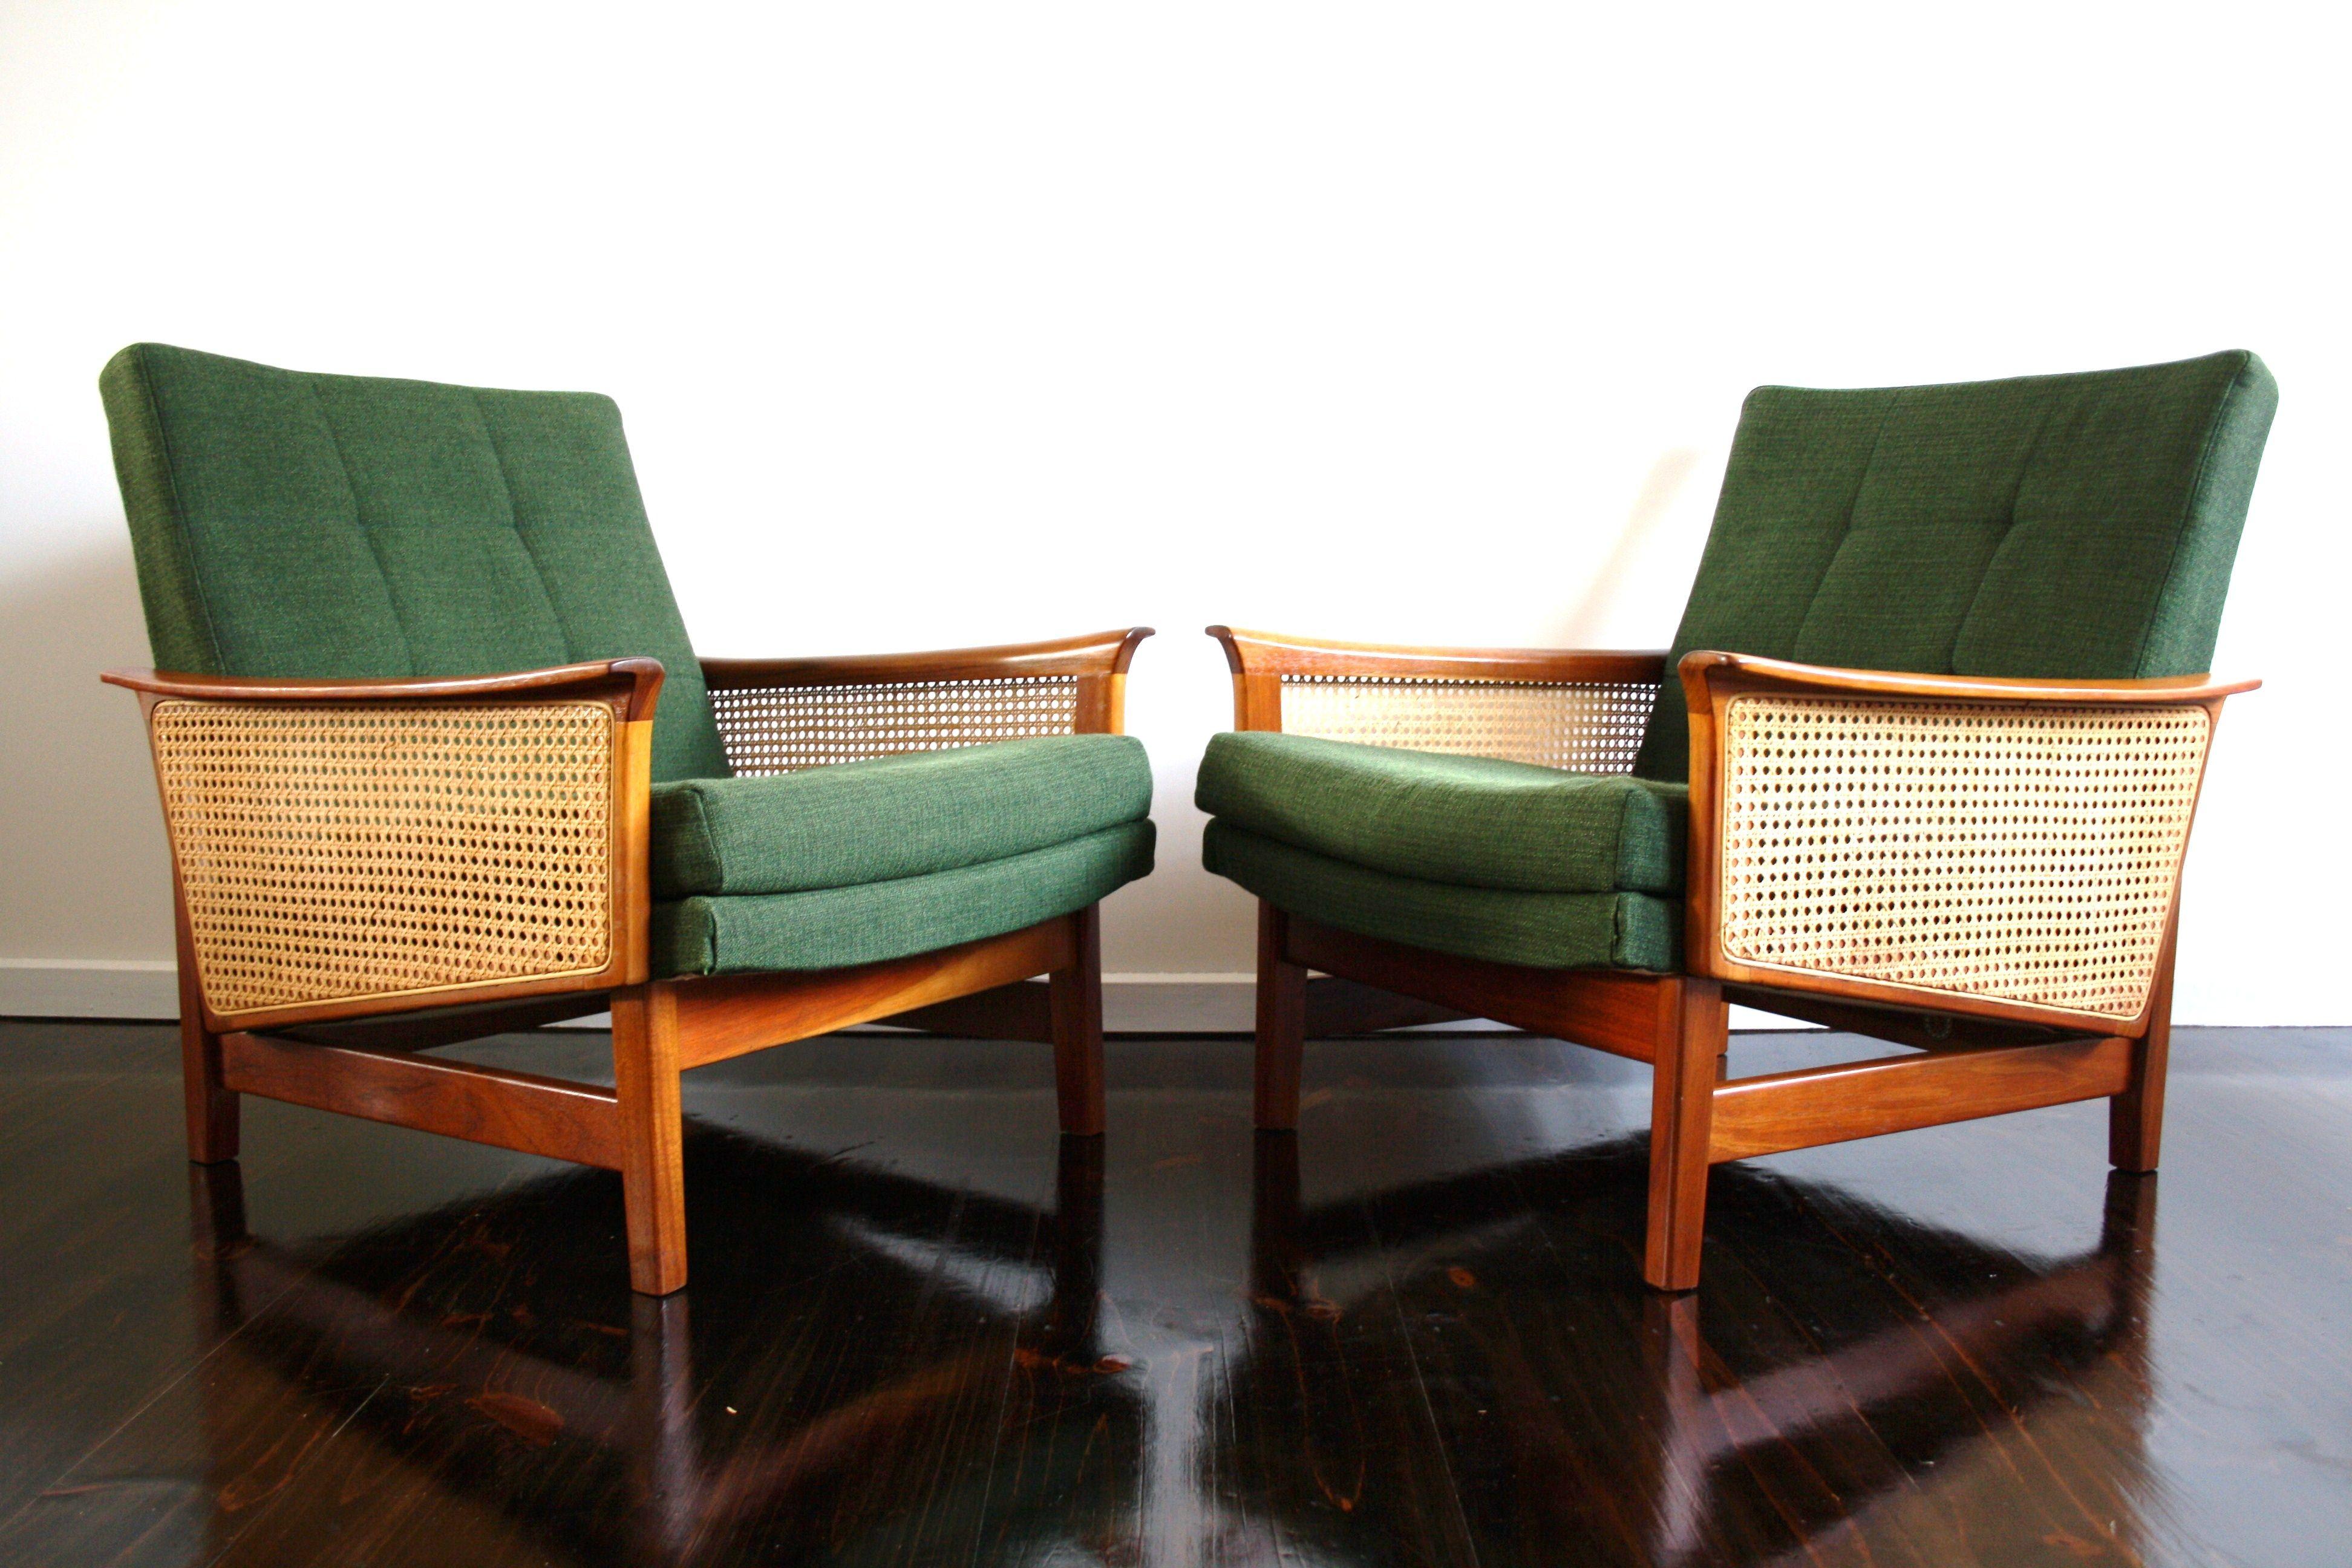 Fler Mid Century armchairs chairs teak rattan cane Retro Vintage